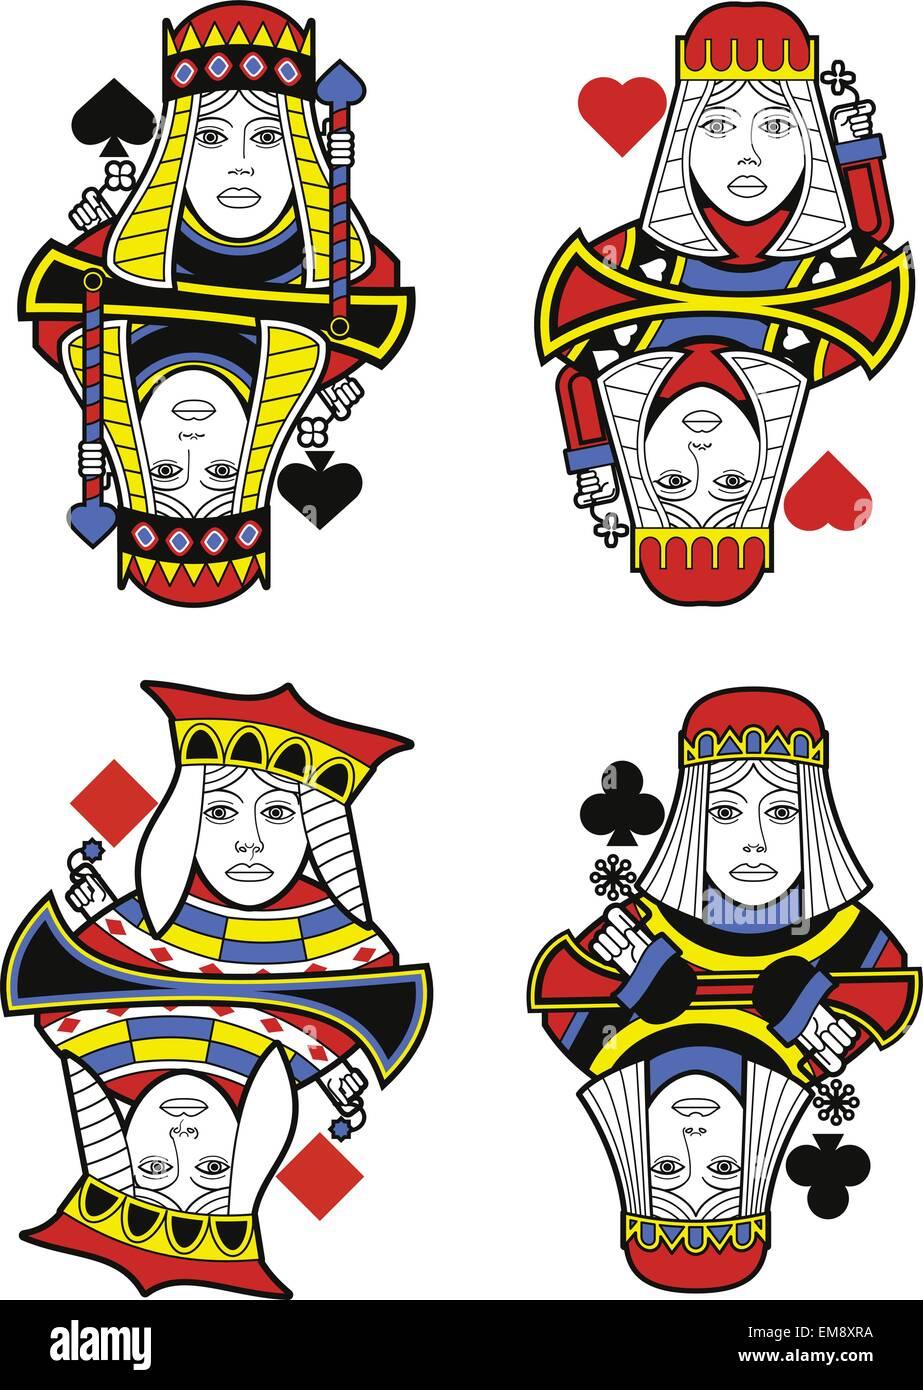 Quatre reines sans cartes. Design original Photo Stock